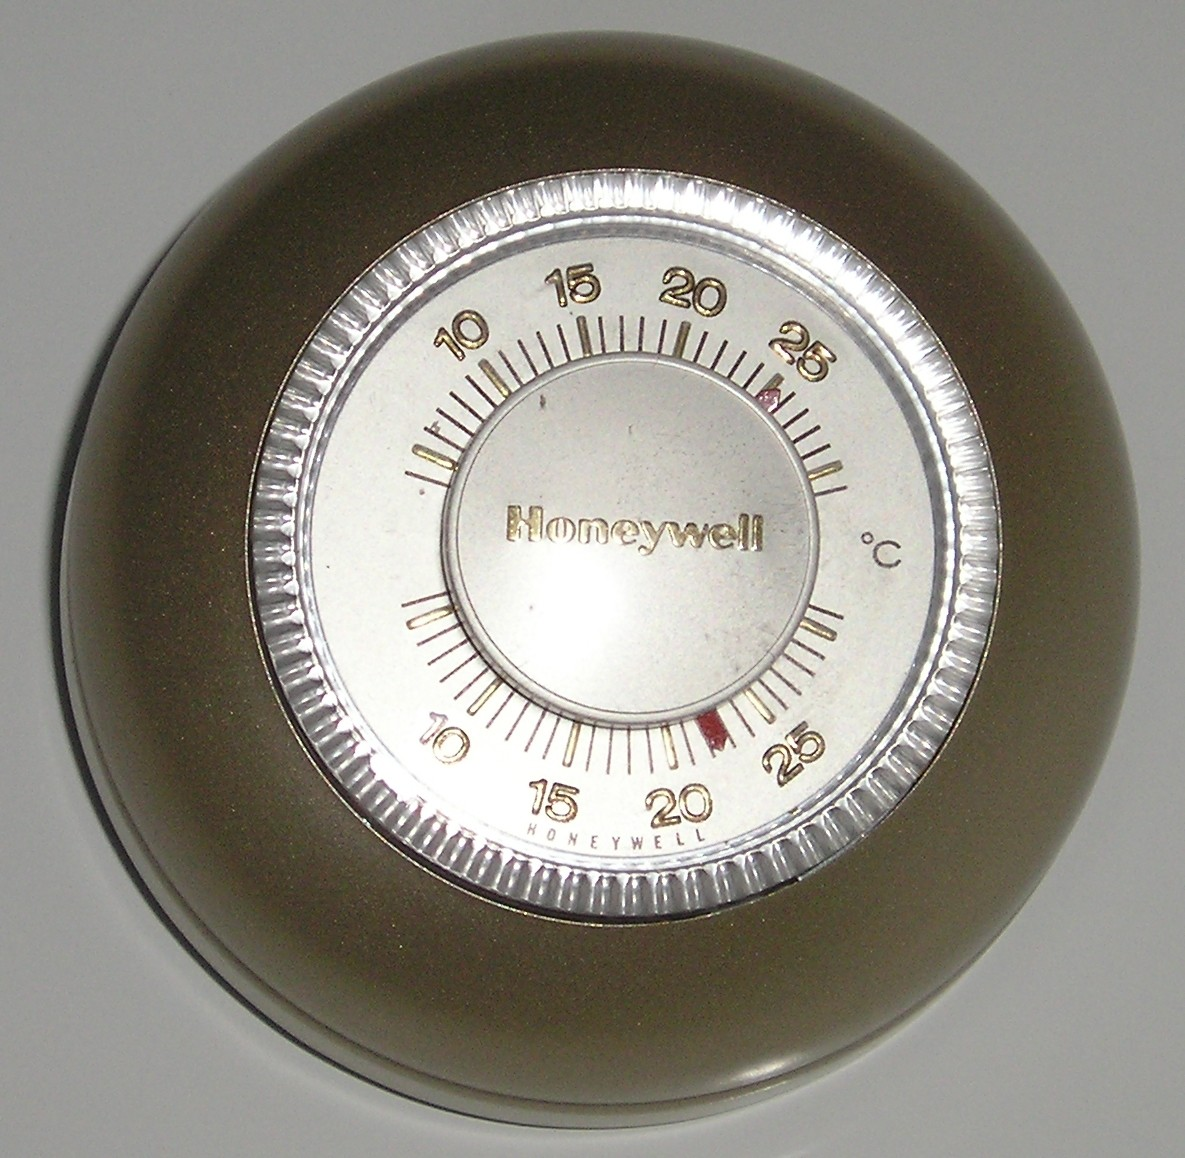 File Honeywell thermostat